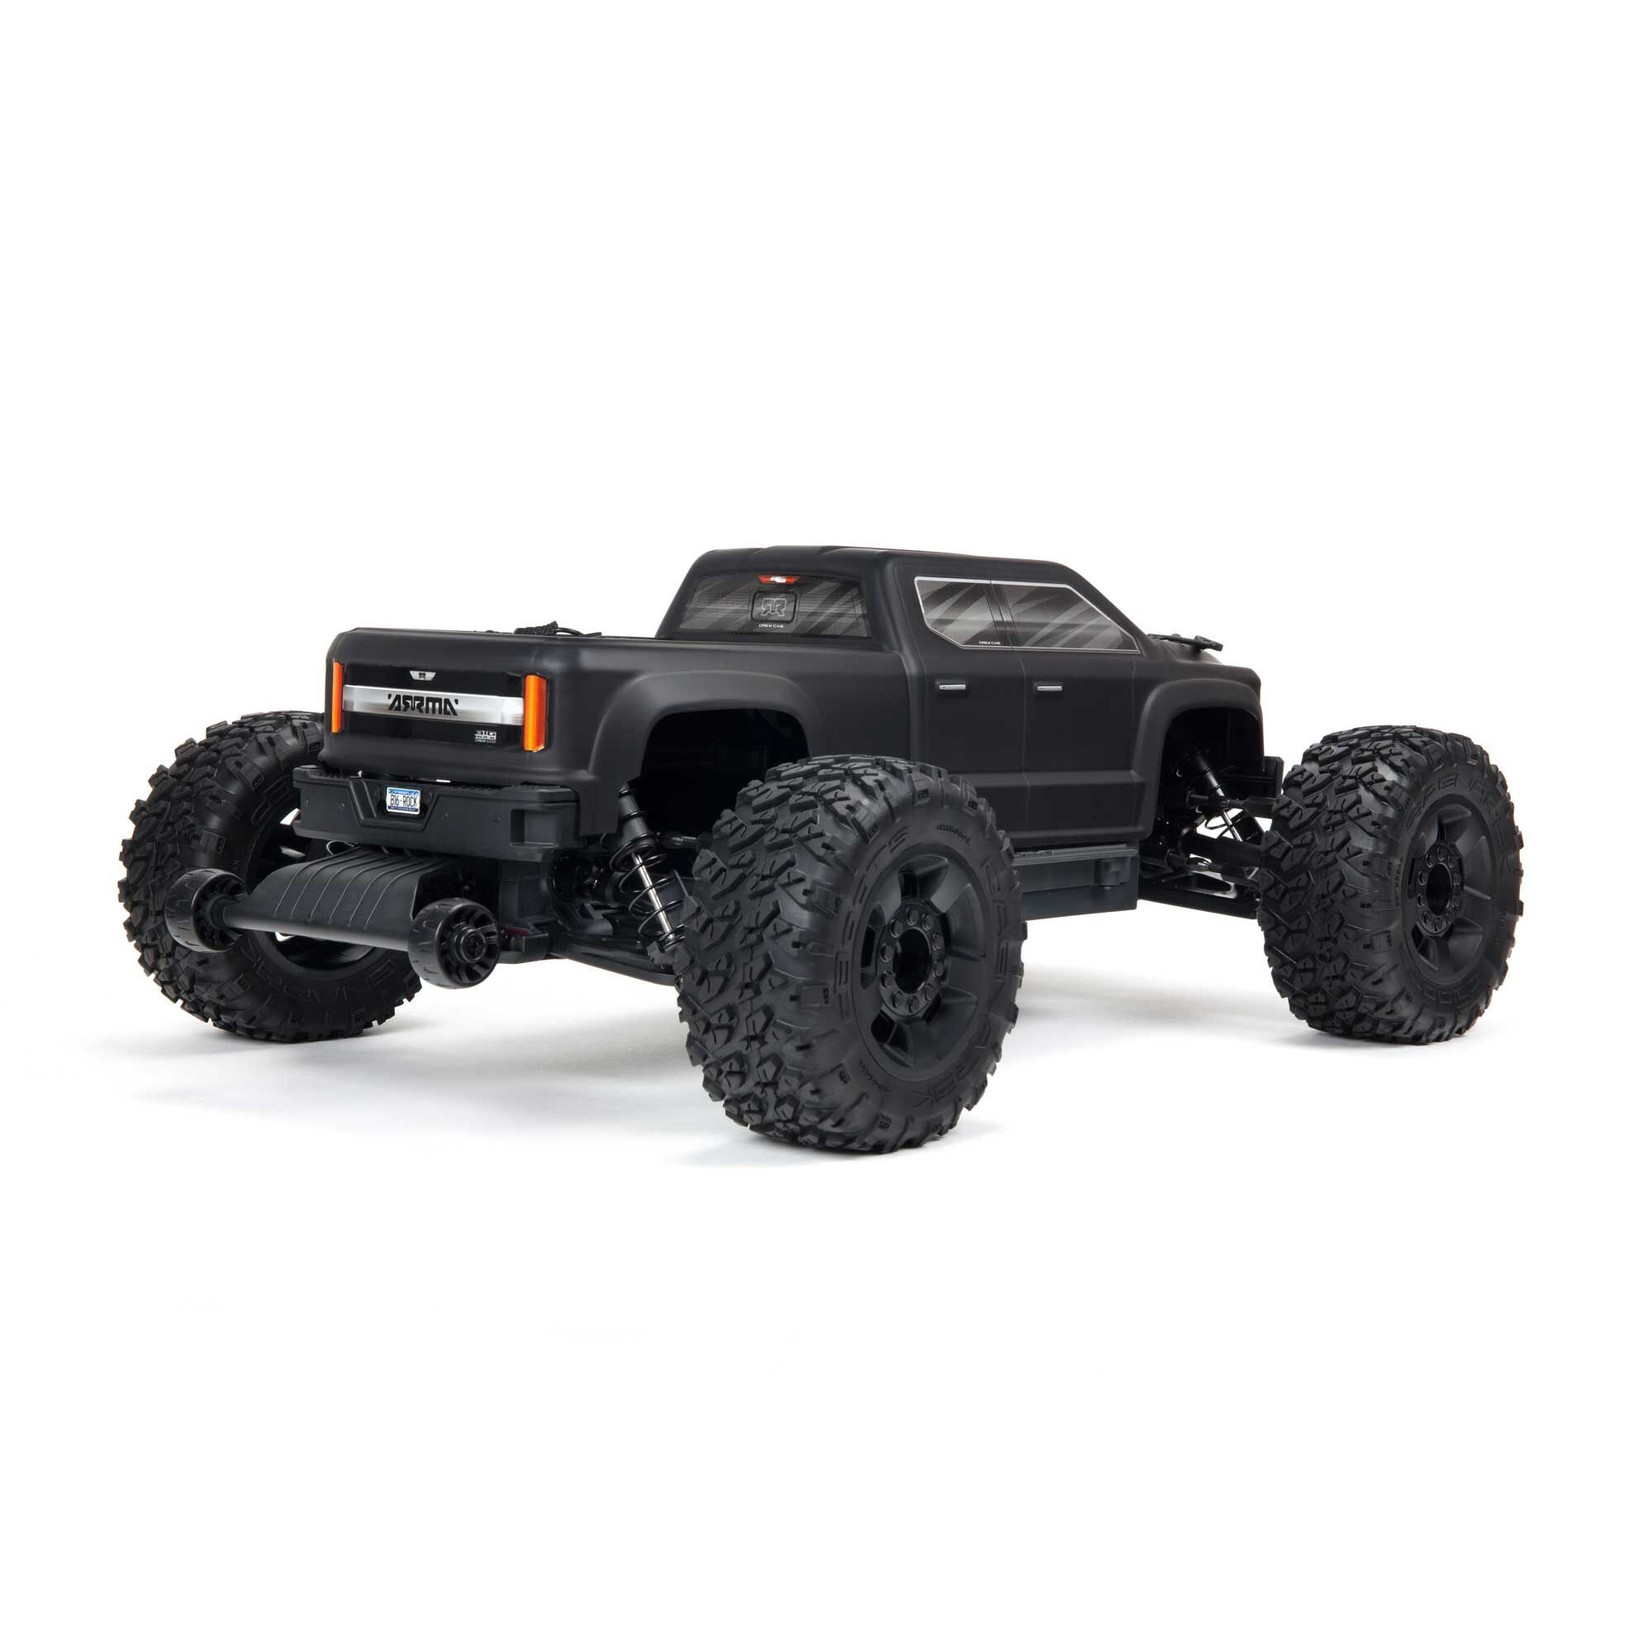 ARRMA ARA4312V3 Arrma Big Rock 4X4 3S BLX Brushless 1/10th 4WD MT Black